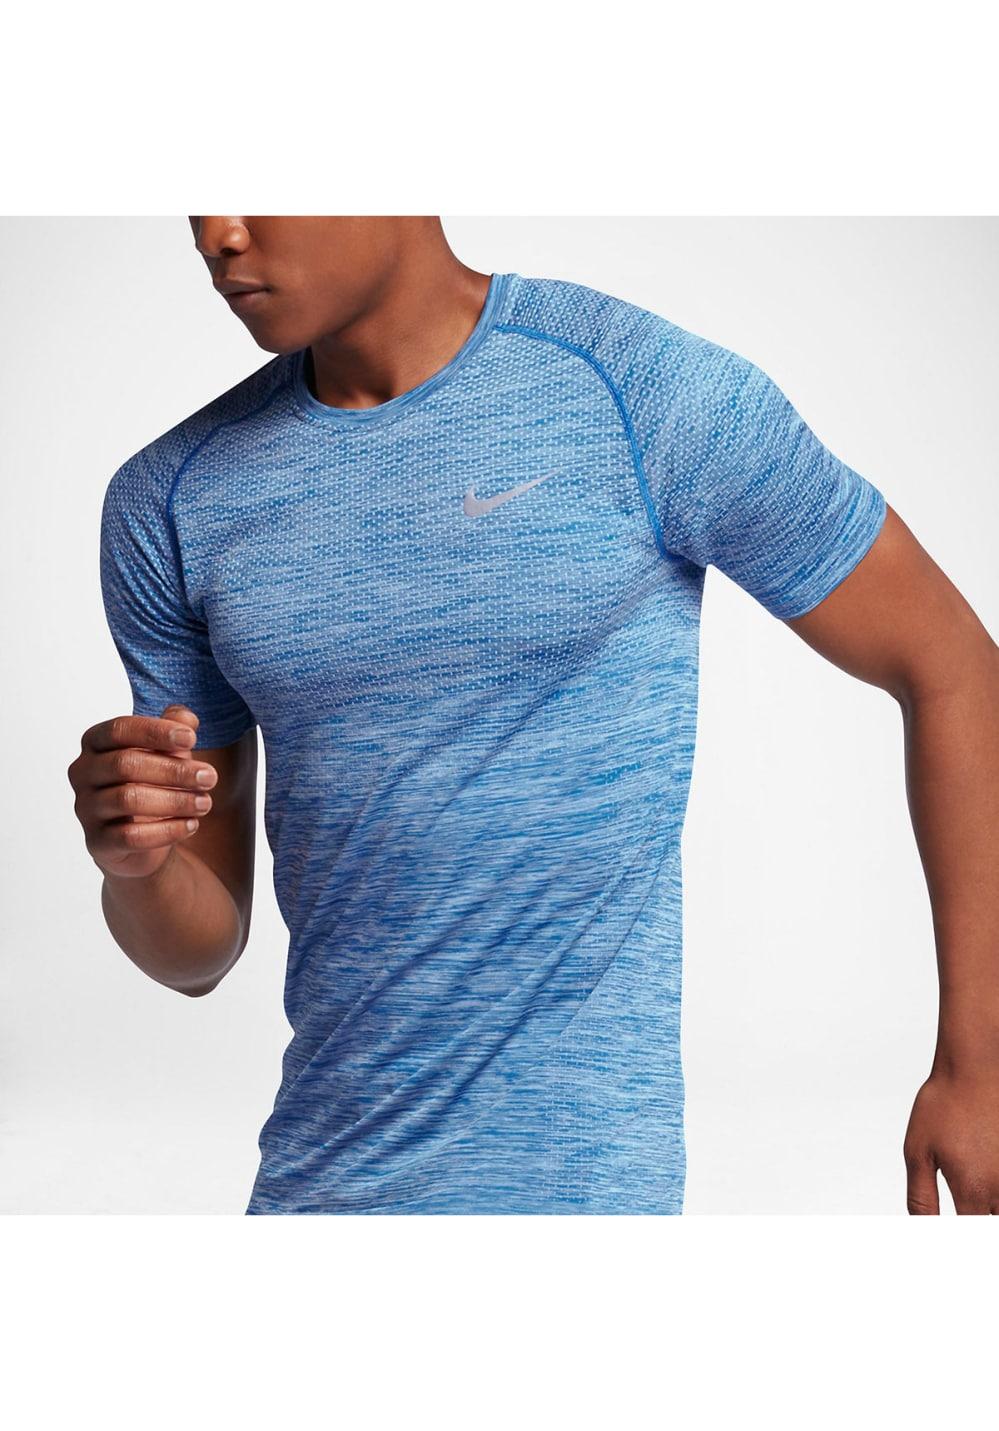 grand choix de 3e4e5 7da16 Nike Dri-FIT Knit Running Top - Maillot de course pour Homme - Bleu